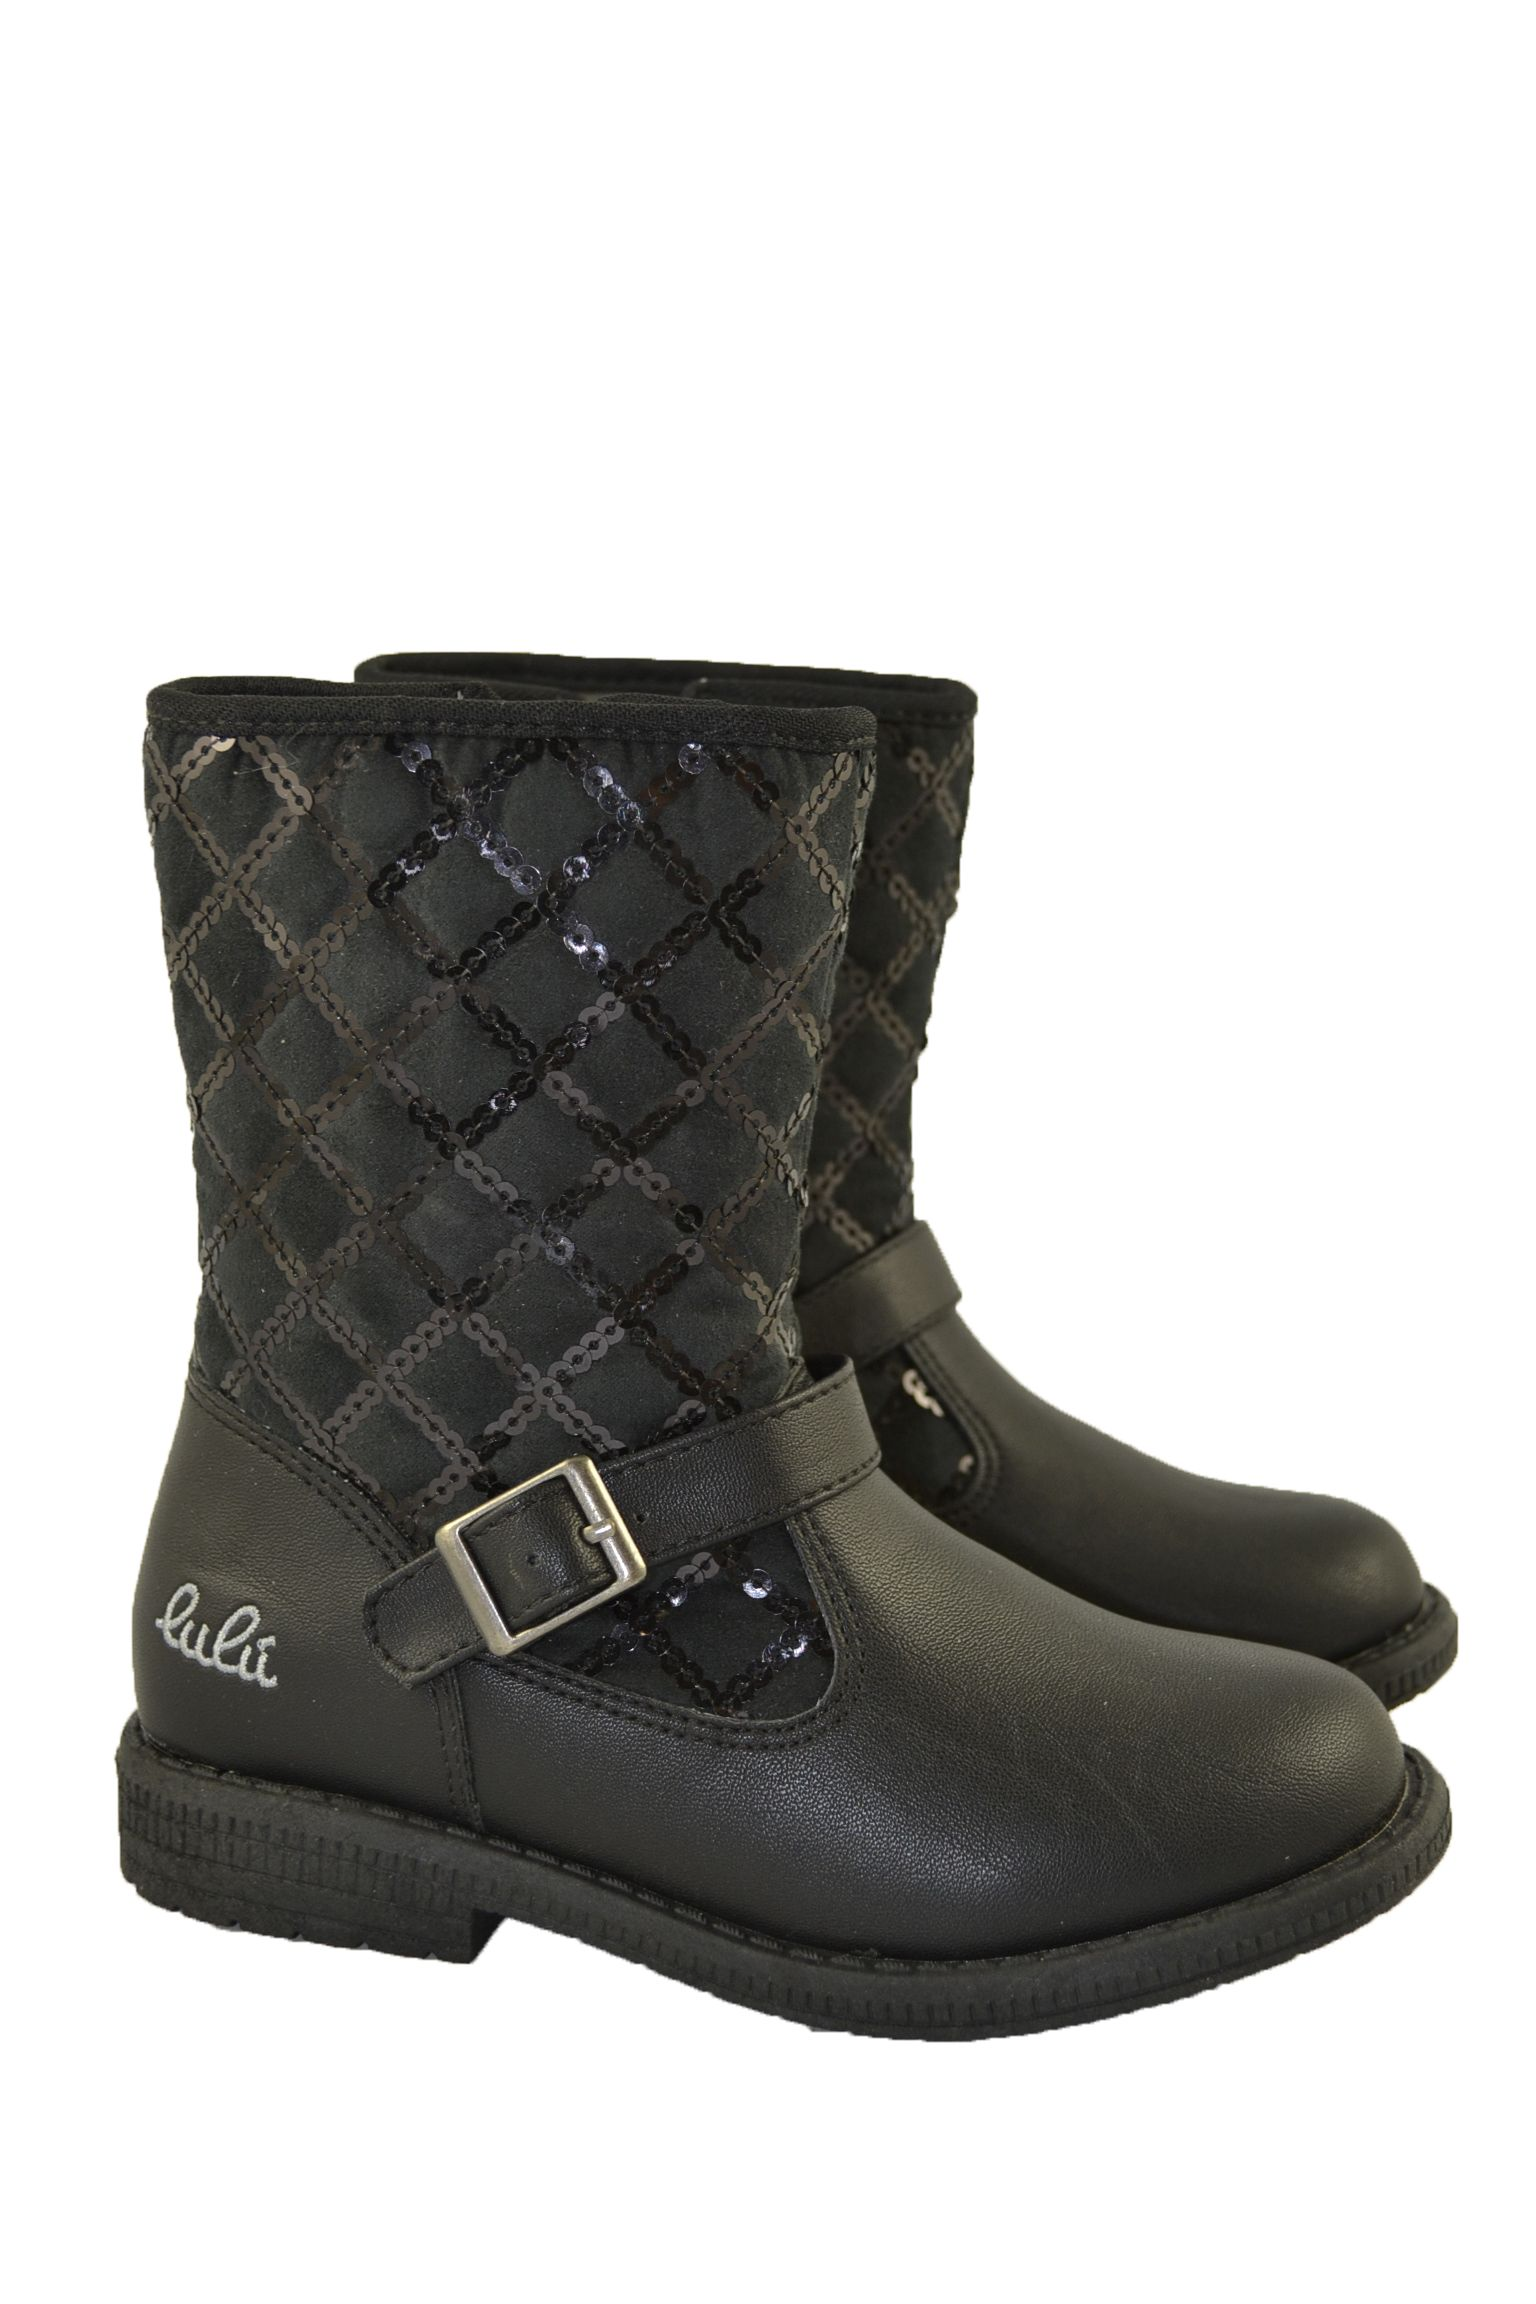 7ffbfdf4 Botas Liz Negras Para Niñas | Shoes | Botas, Botas de niña, Botas ...